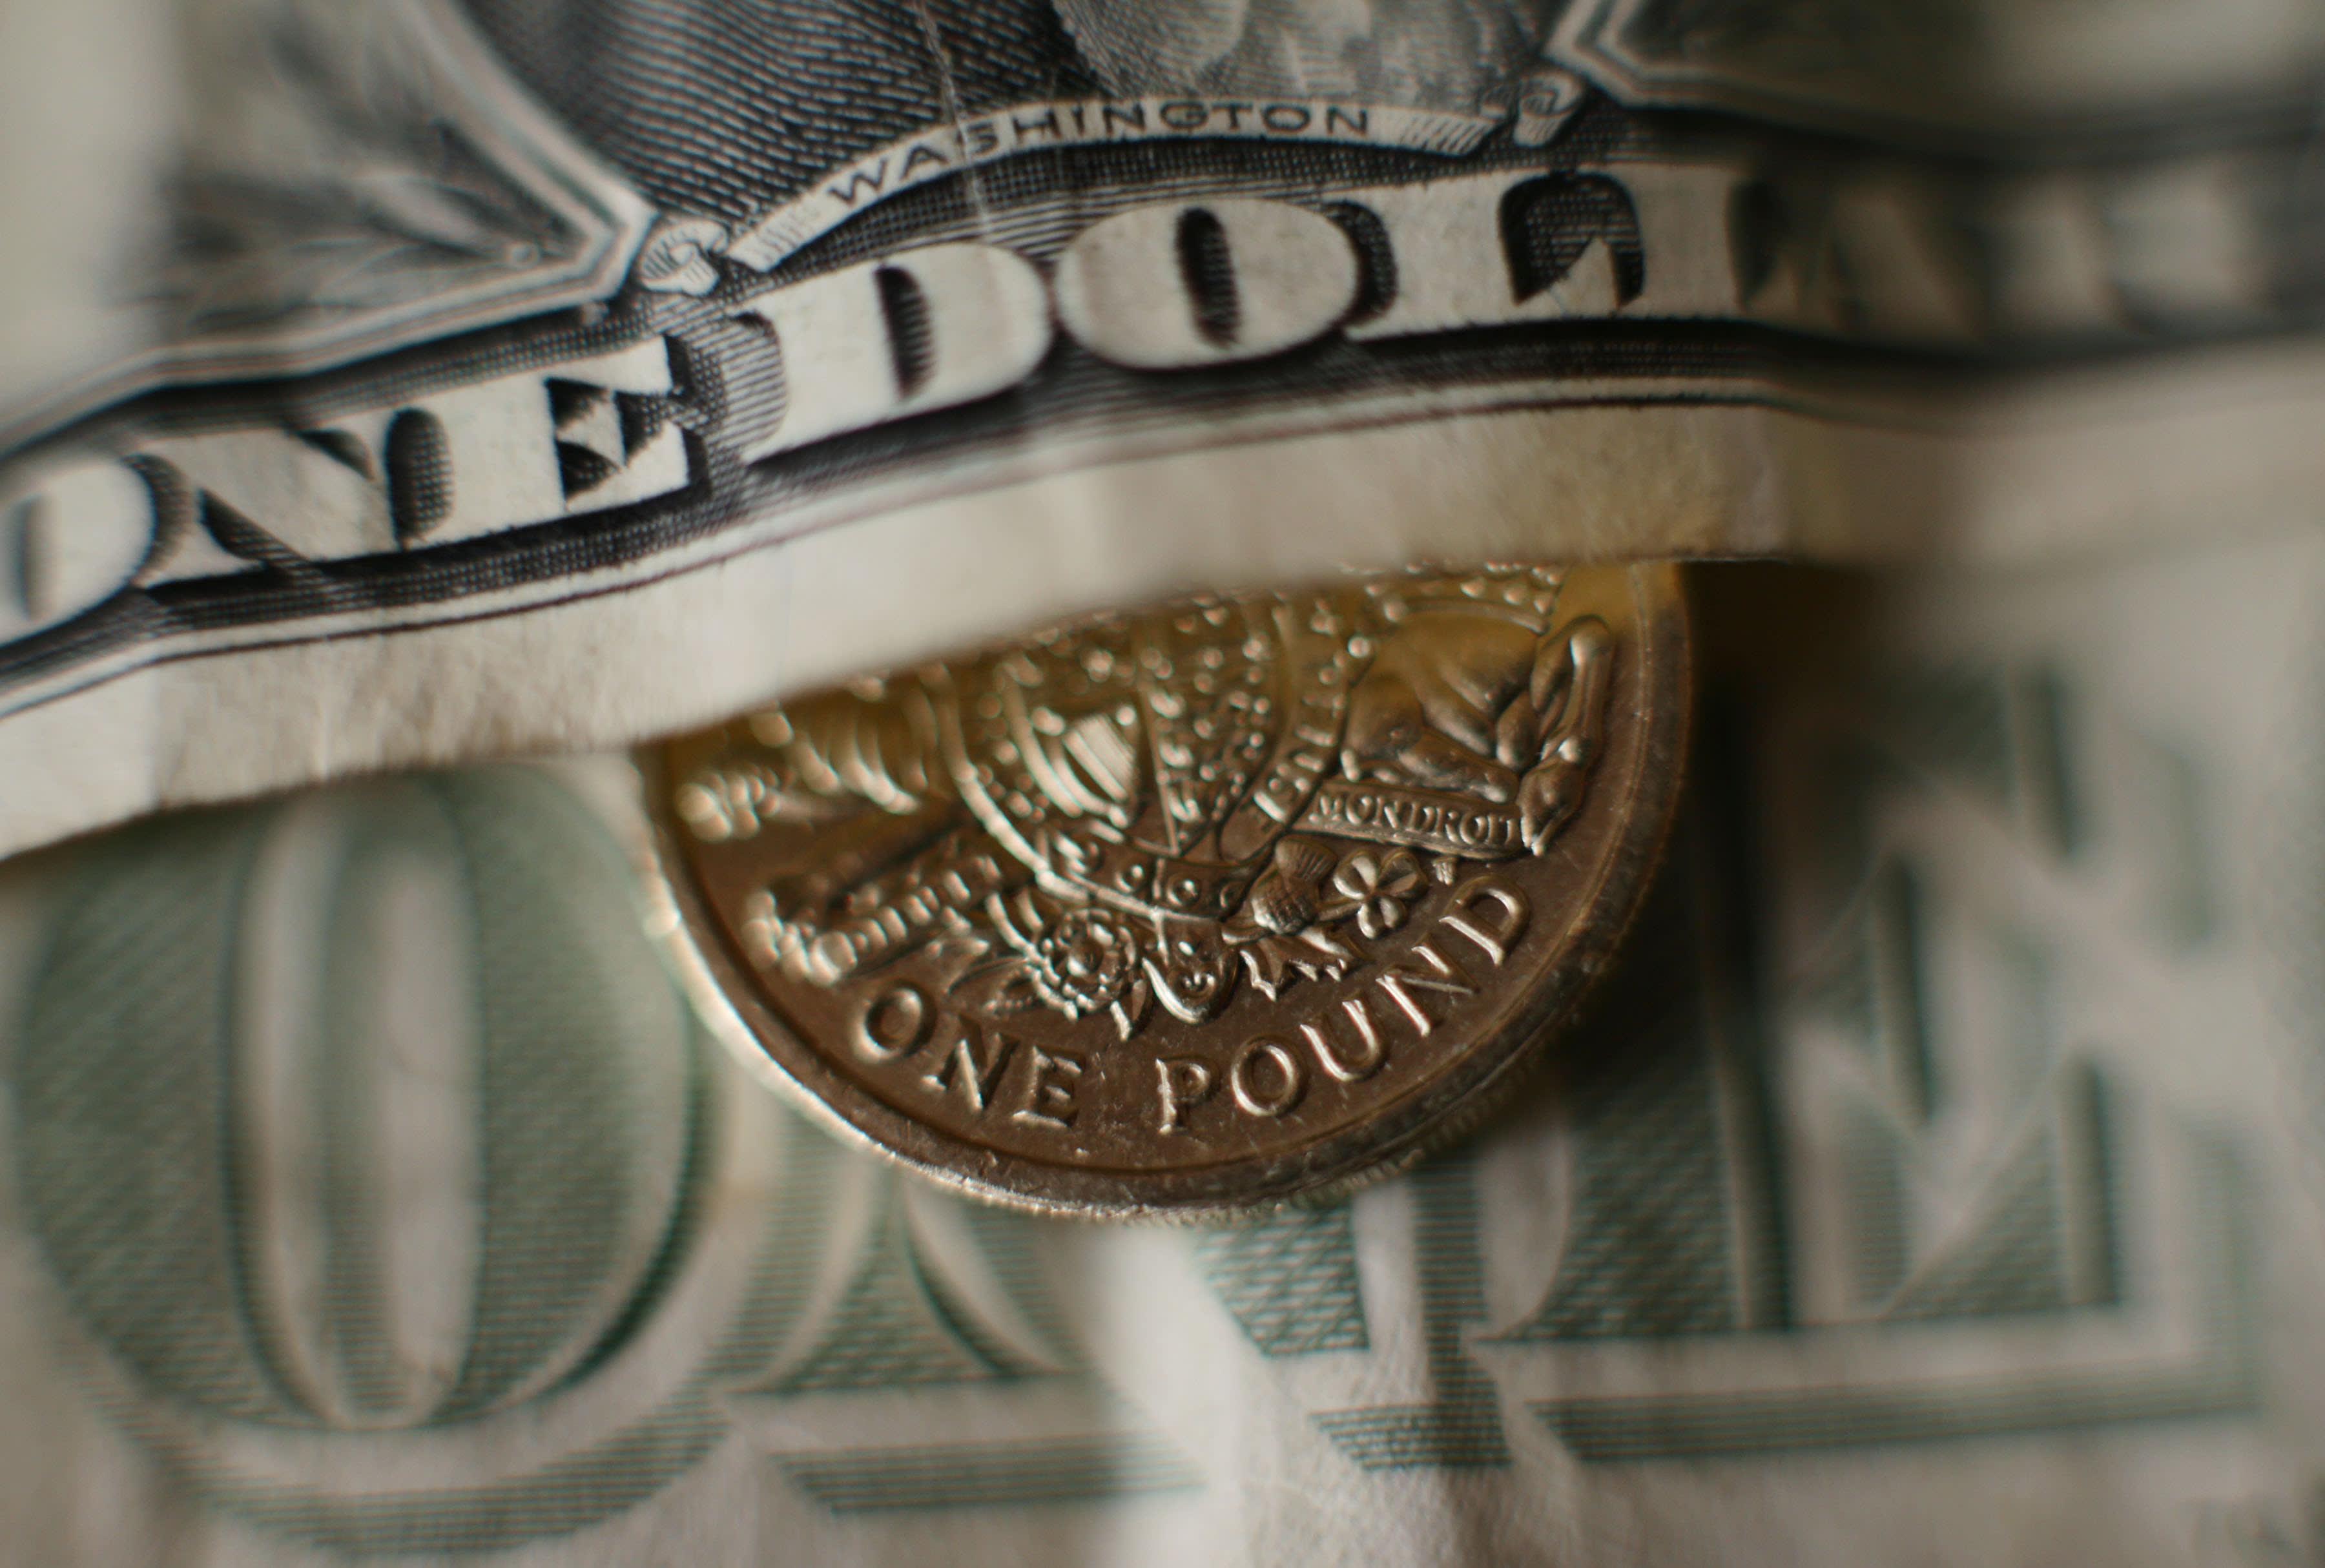 Pound slides to 34-year low despite govt action